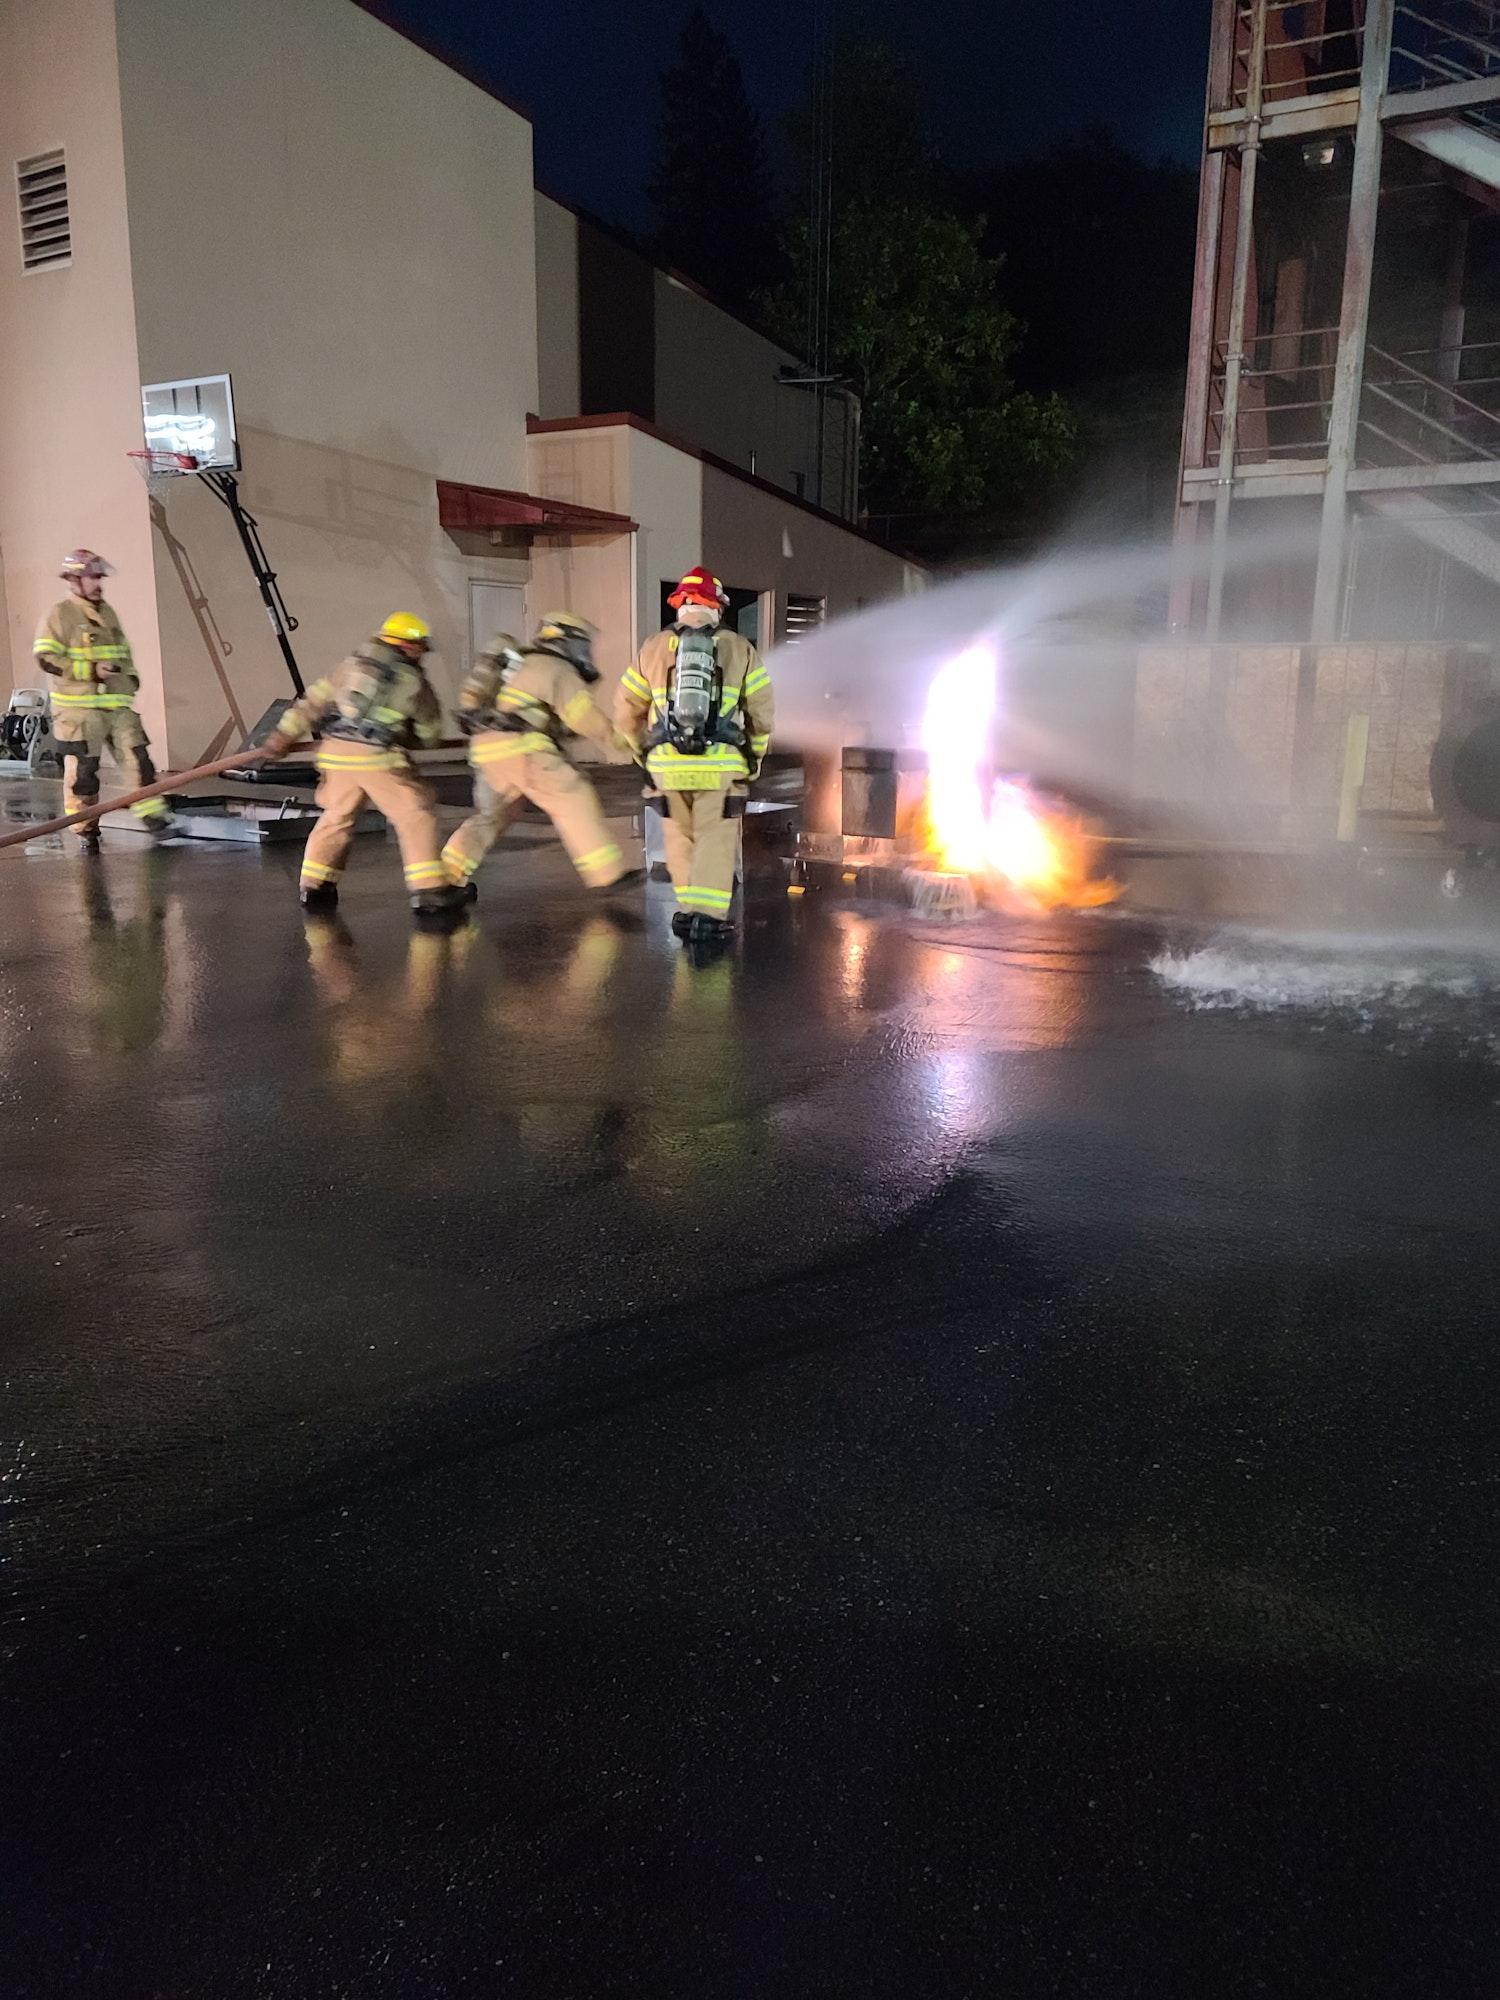 May contain: person, human, fireman, and flooring